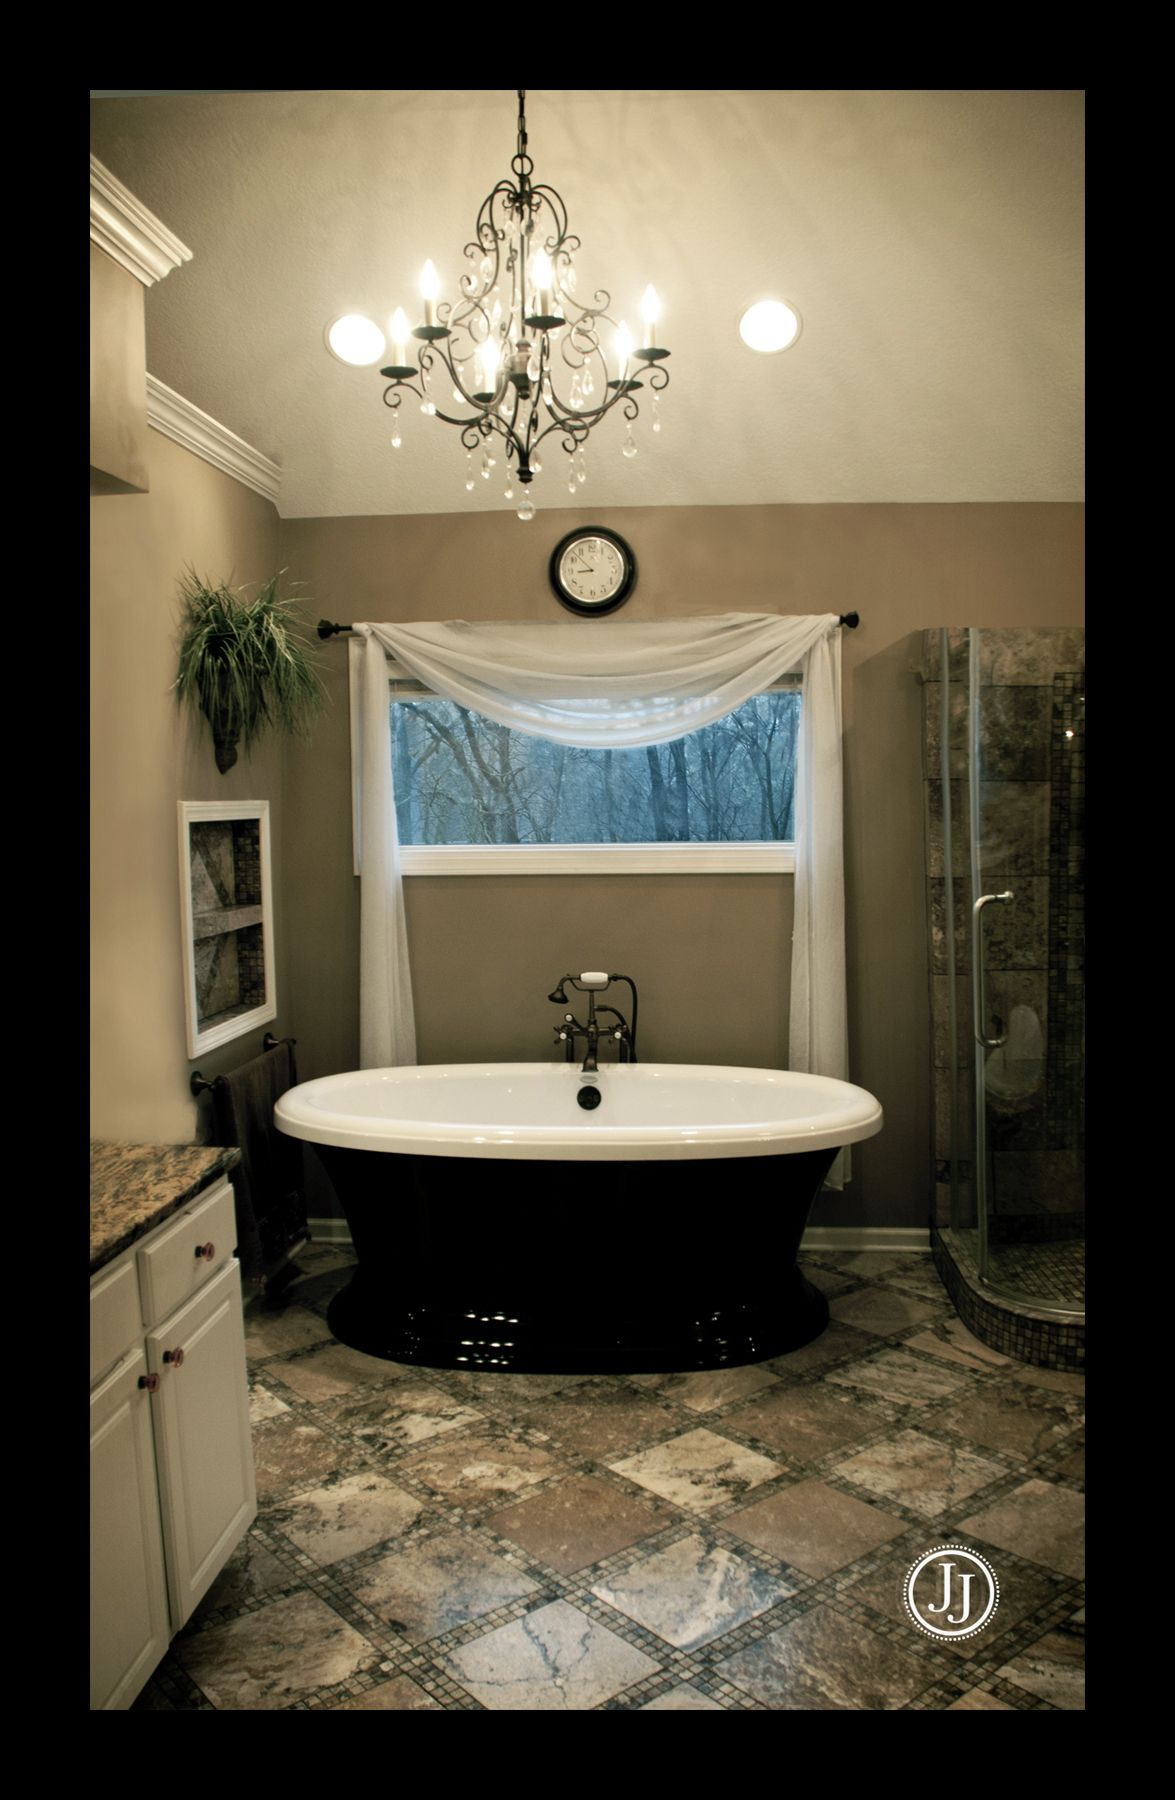 Pin By Jj Kaplan On Home And Hearth Bathroom Wall Colors Bathroom Design Farmhouse Bathroom